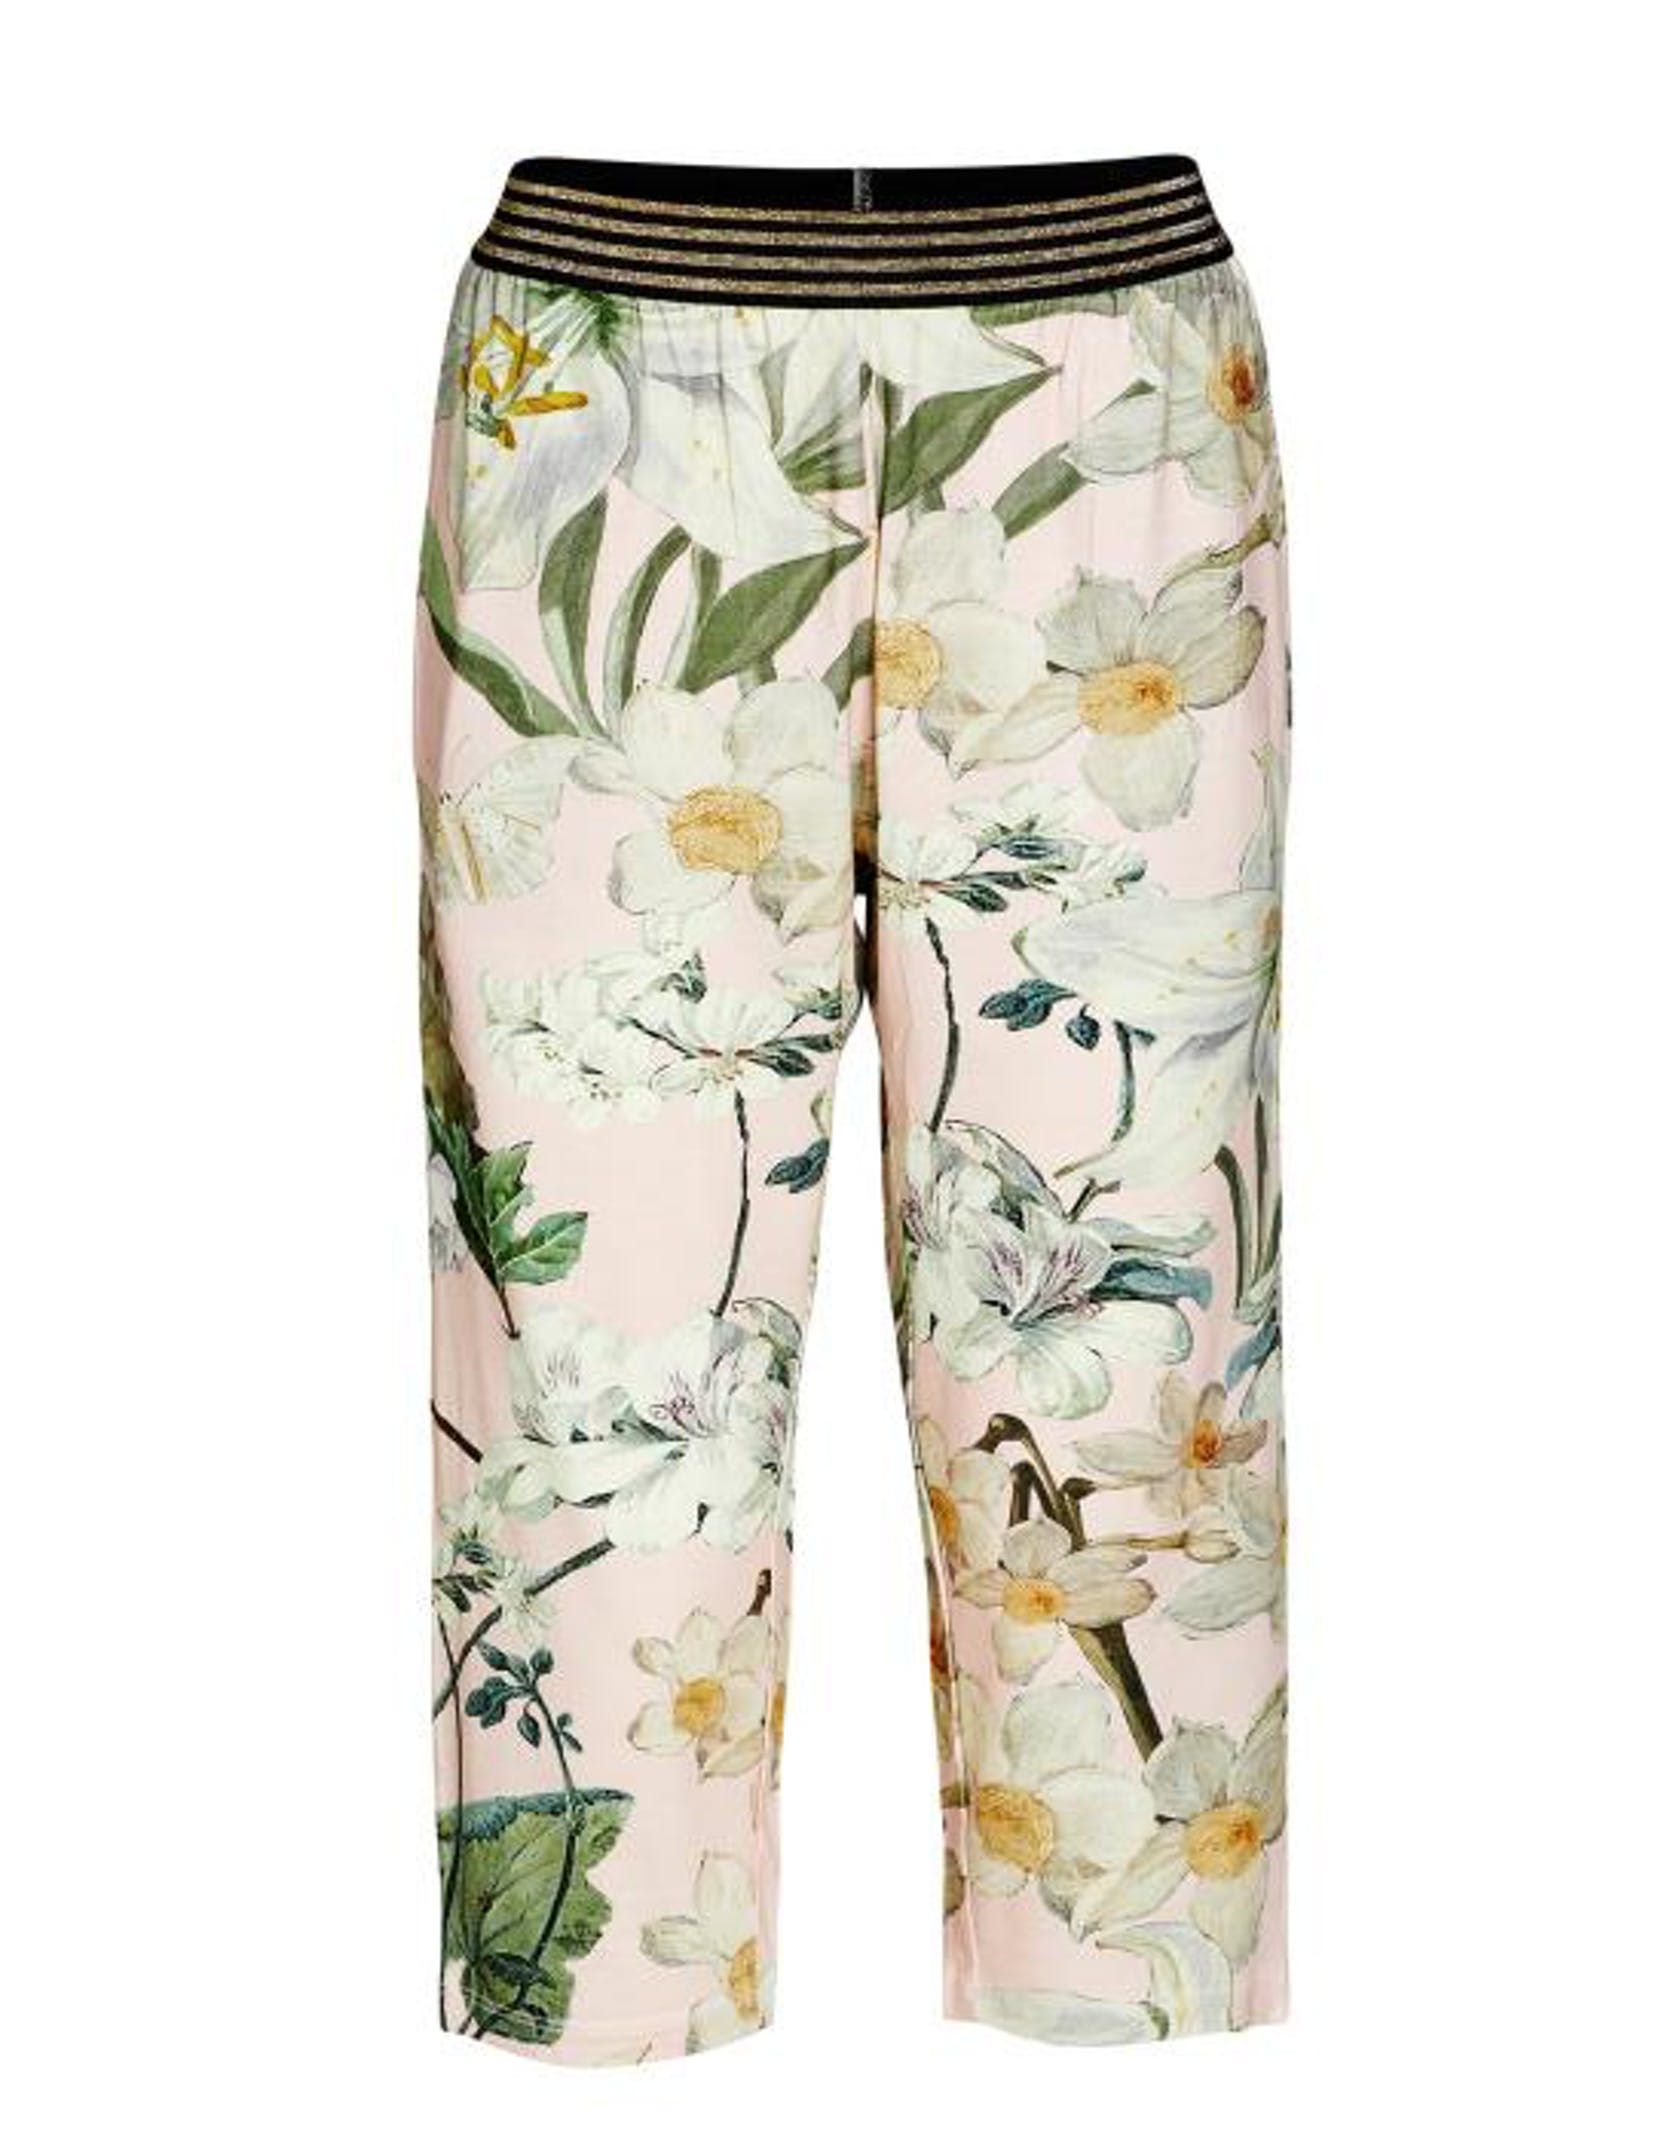 ESSENZA Rosie Rosalee  Trousers 3/4 Rose